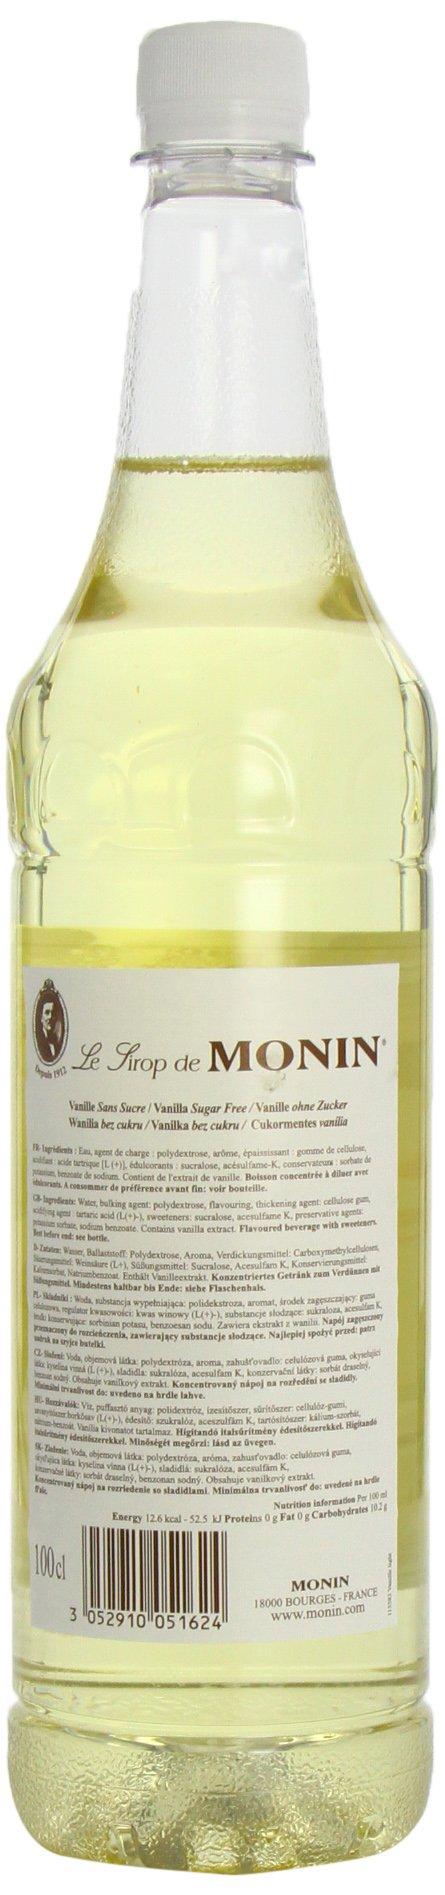 Monin-Premium-Vanilla-Sugar-Free-Syrup-1-L